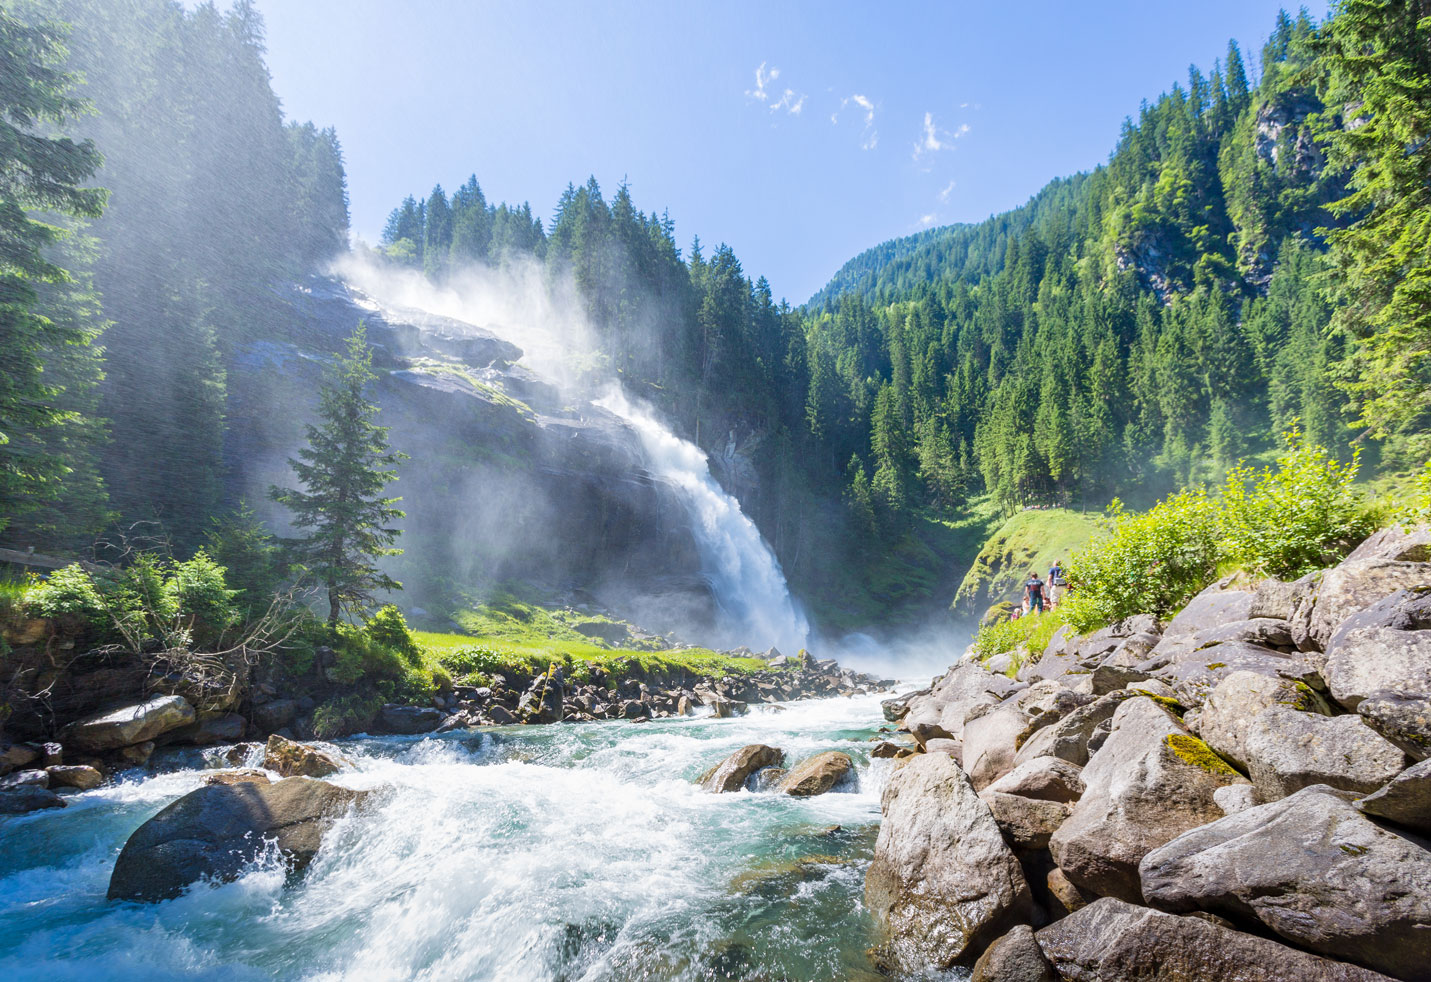 Krimmler Wasserfälle Hohe Tauern Nationalpark SalzburgerLand